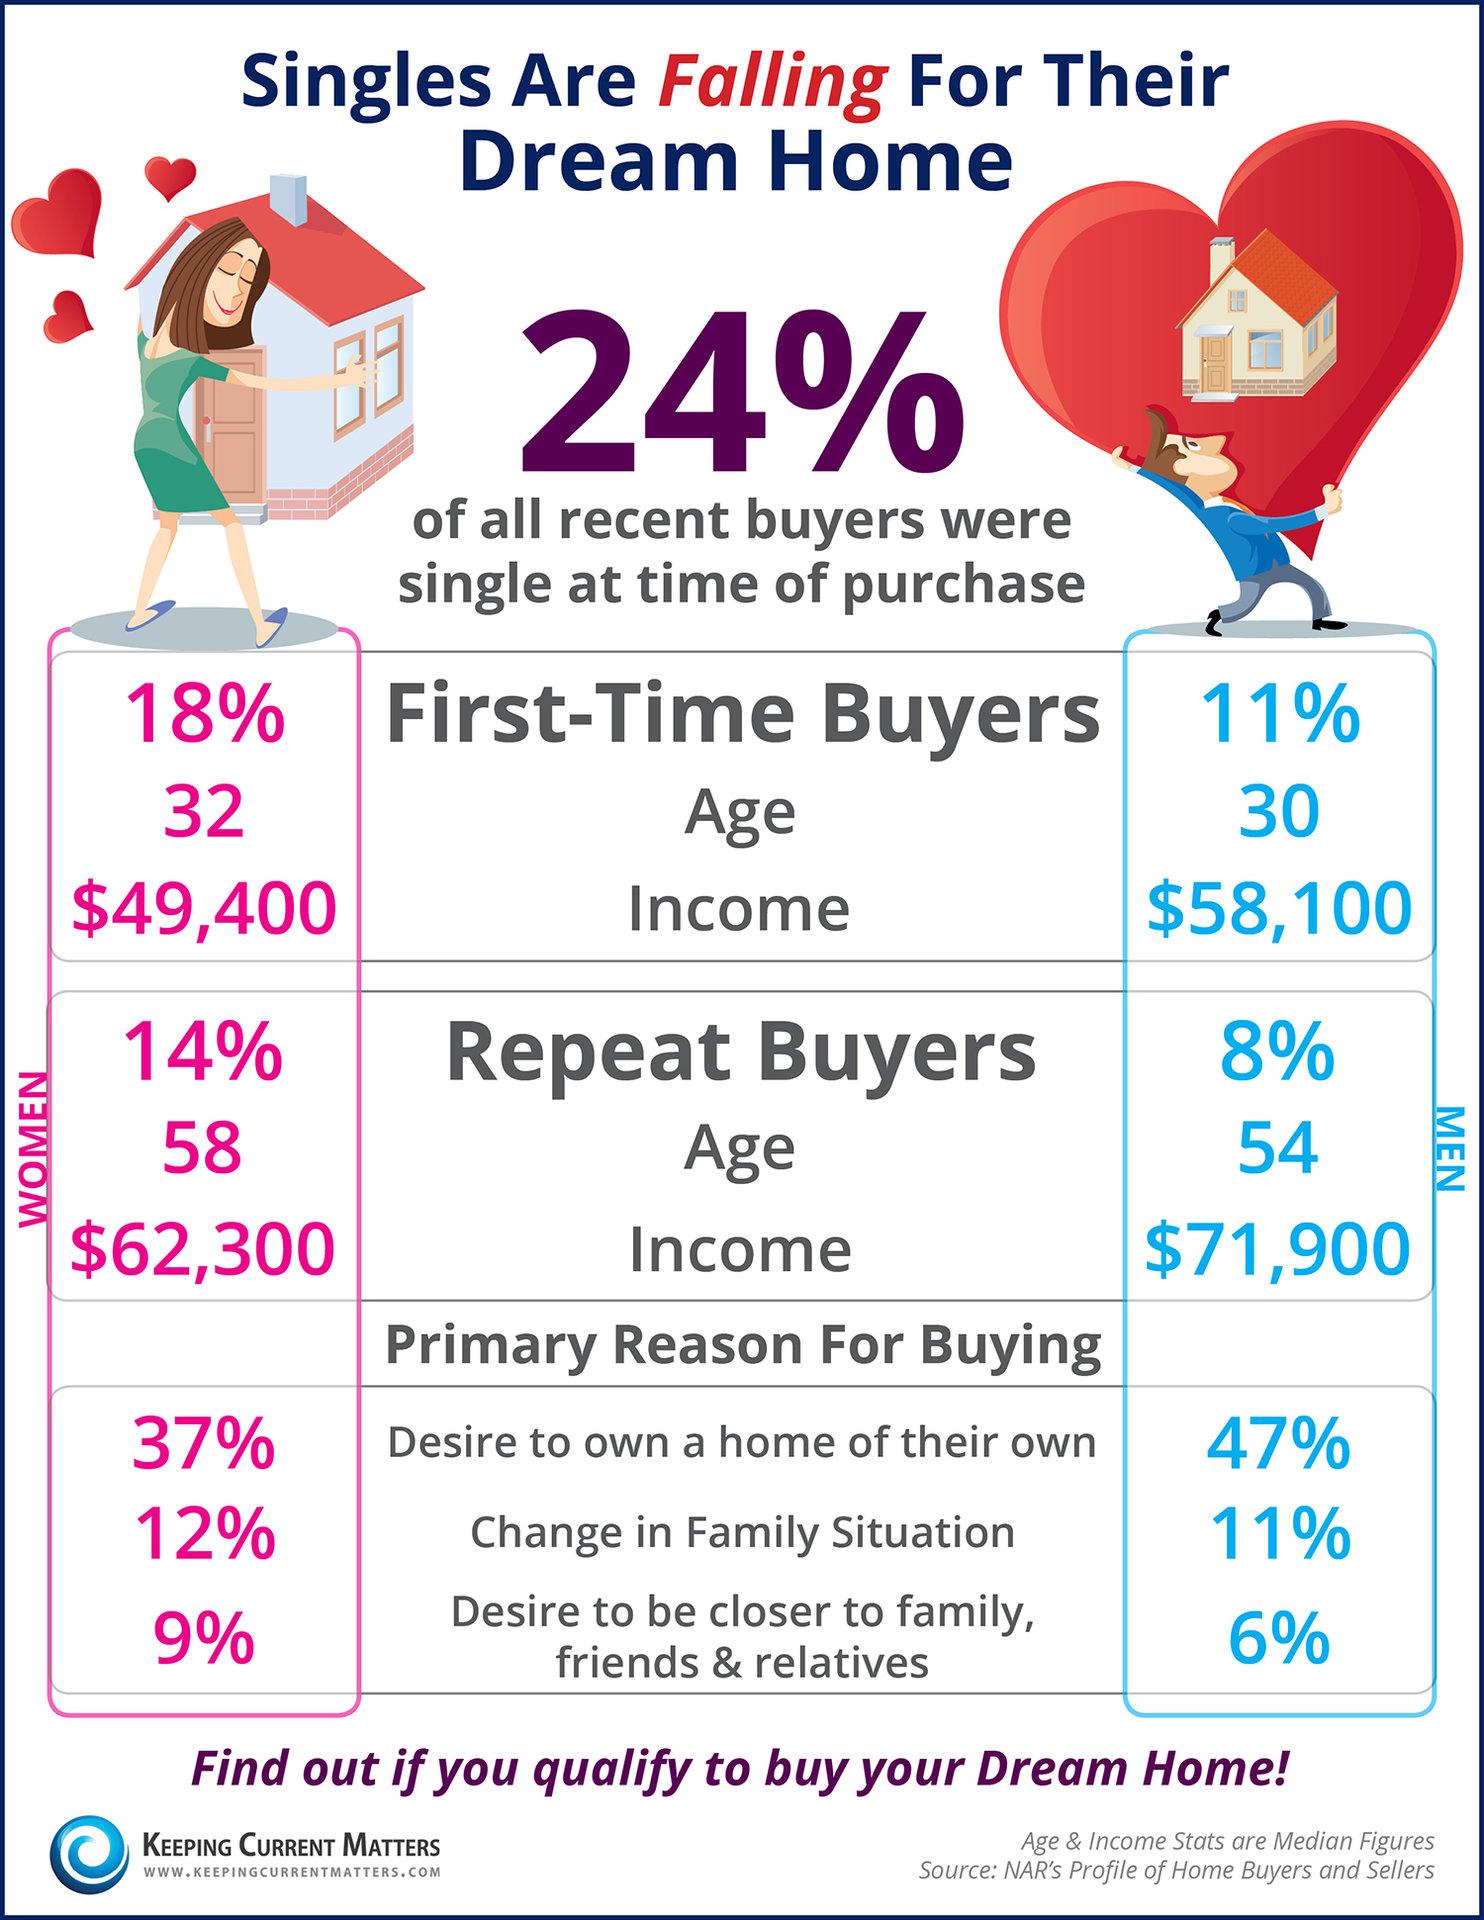 https://i2.wp.com/www.keepingcurrentmatters.com/wp-content/uploads/2016/03/Single-Home-Buyers-KCM.jpg